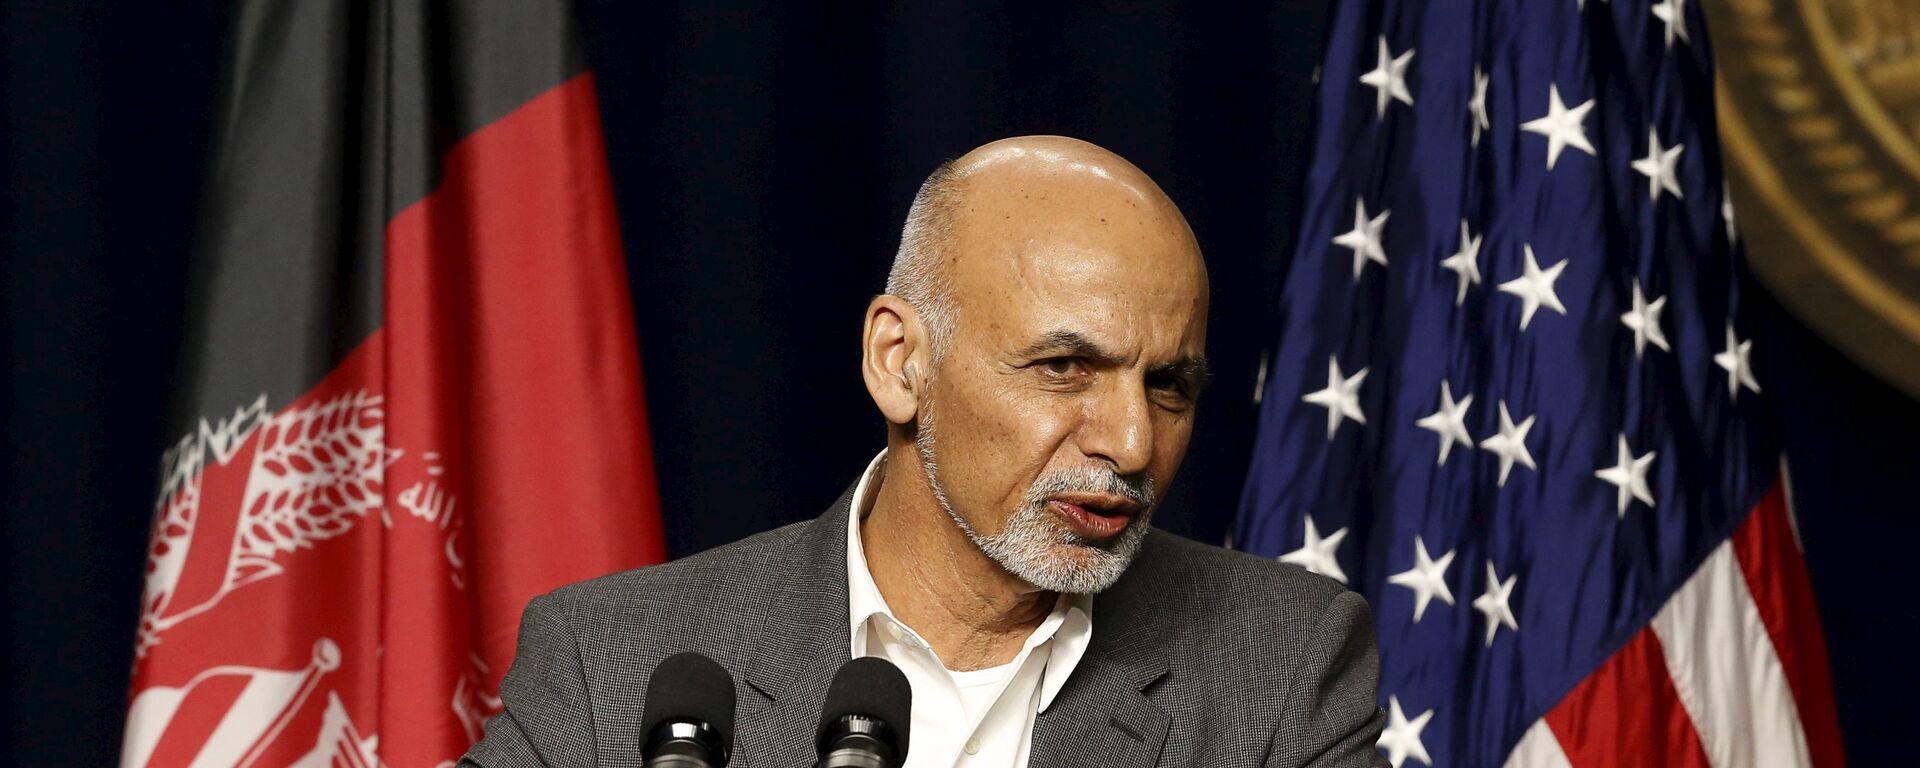 Afghanistan President Ashraf Ghani answers questions at a news conference at Camp David, Maryland March 23, 2015 - Sputnik Polska, 1920, 15.08.2021